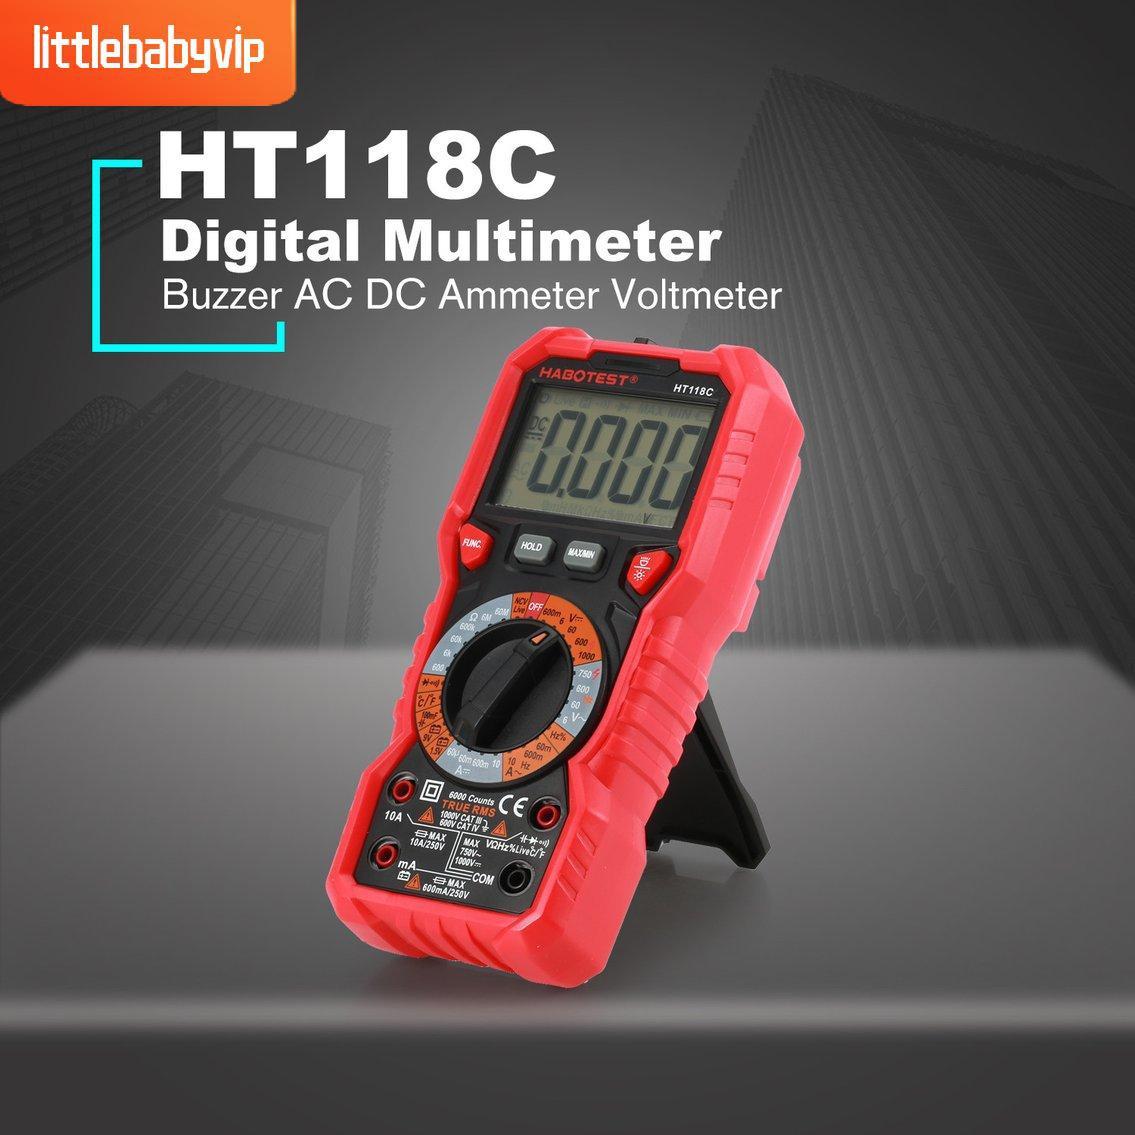 Ht 118 C มัลติมิเตอร์ดิจิตอลไฟแบ็คไลท์ Buzzer ป้องกันการสูญหาย